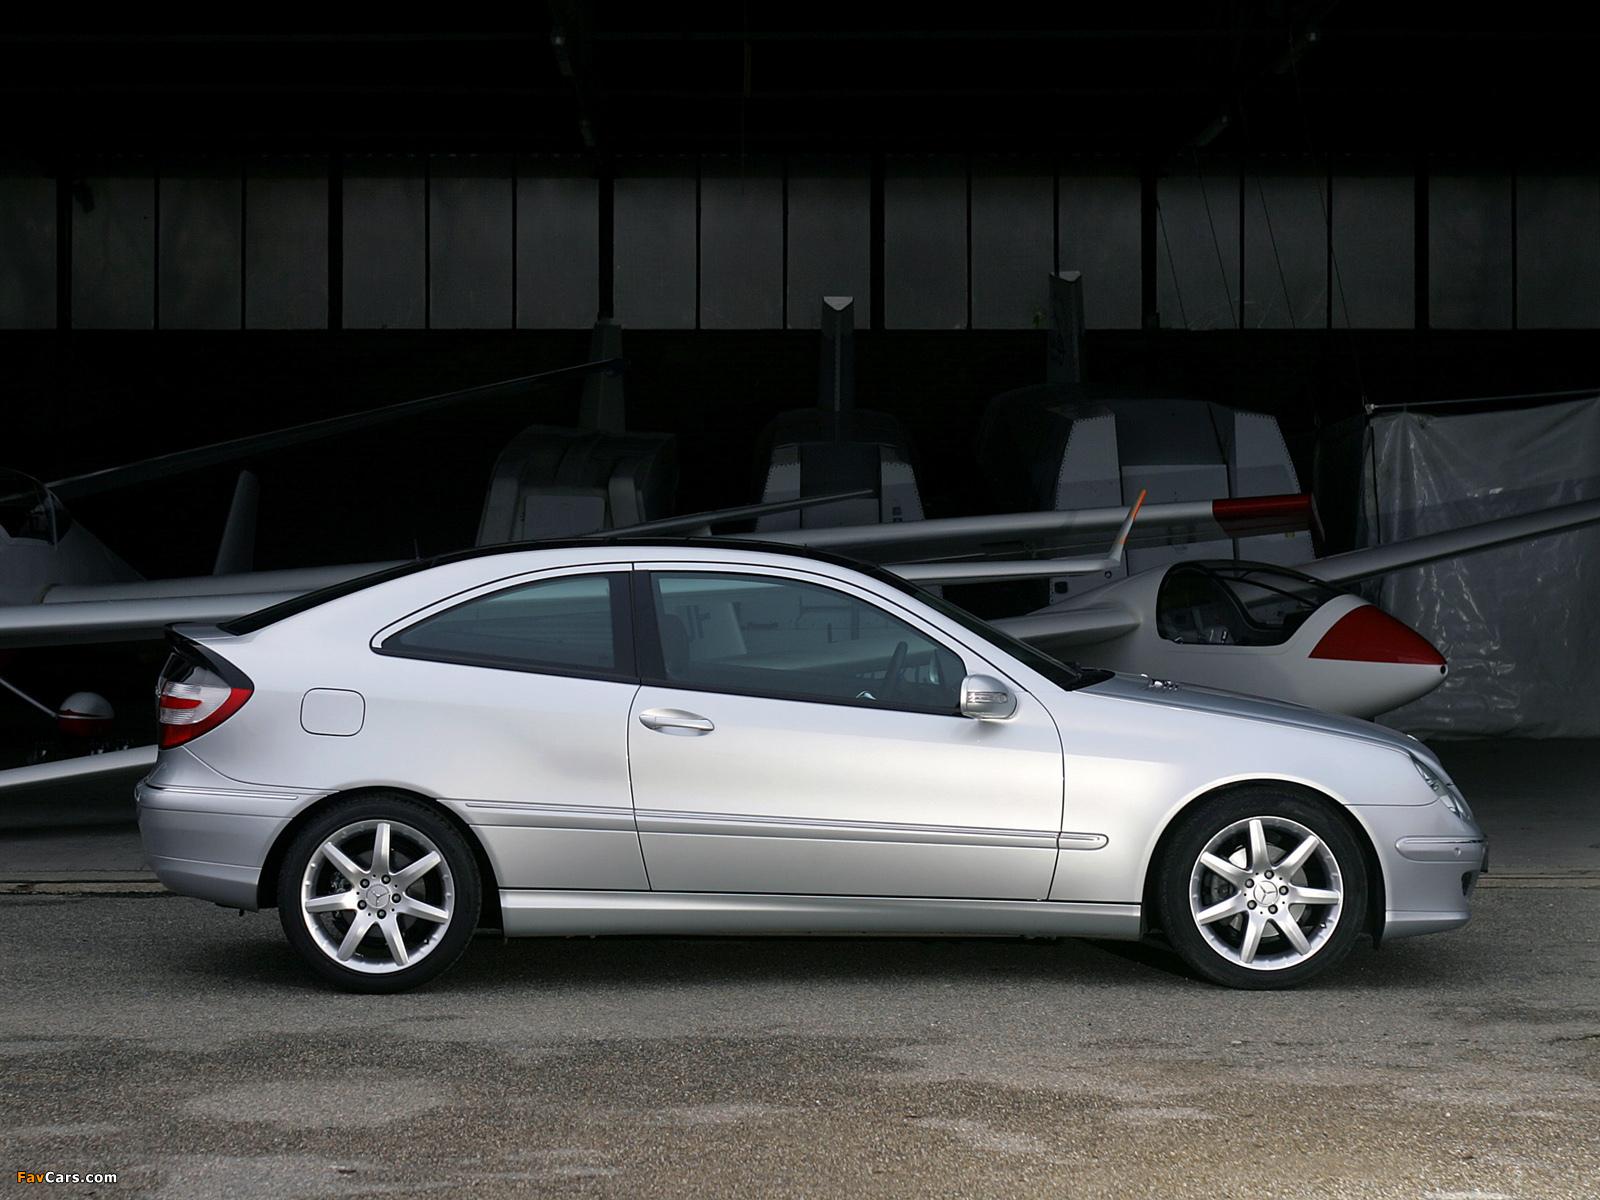 Wallpapers of mercedes benz c 180 kompressor sportcoupe for Mercedes benz kompressor 2005